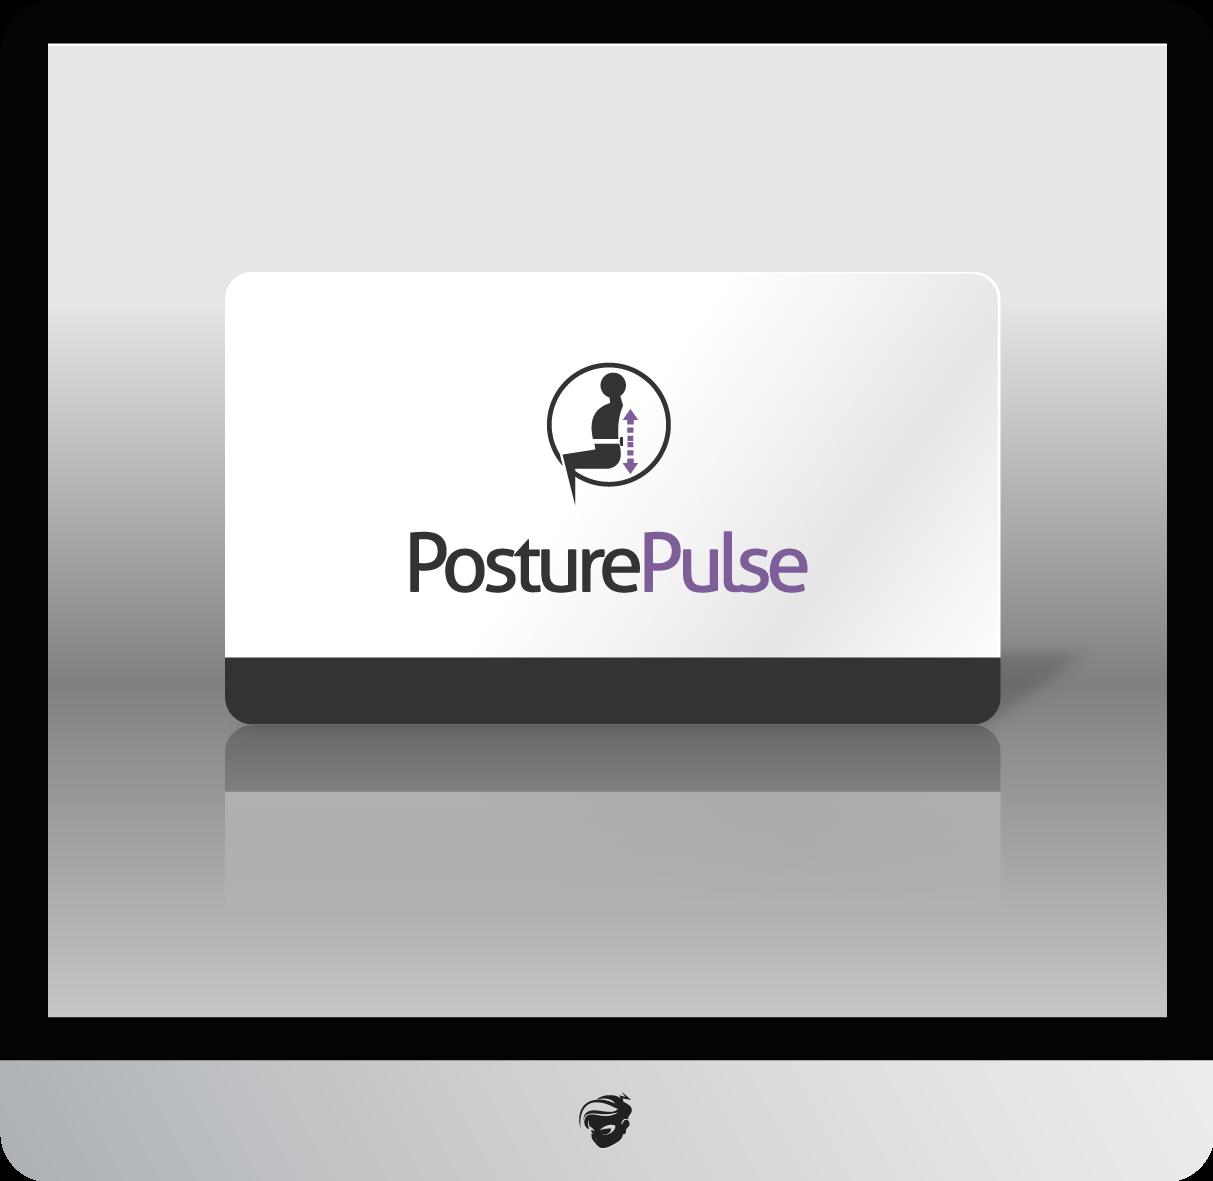 Logo Design by zesthar - Entry No. 111 in the Logo Design Contest Unique Logo Design Wanted for PosturePulse.